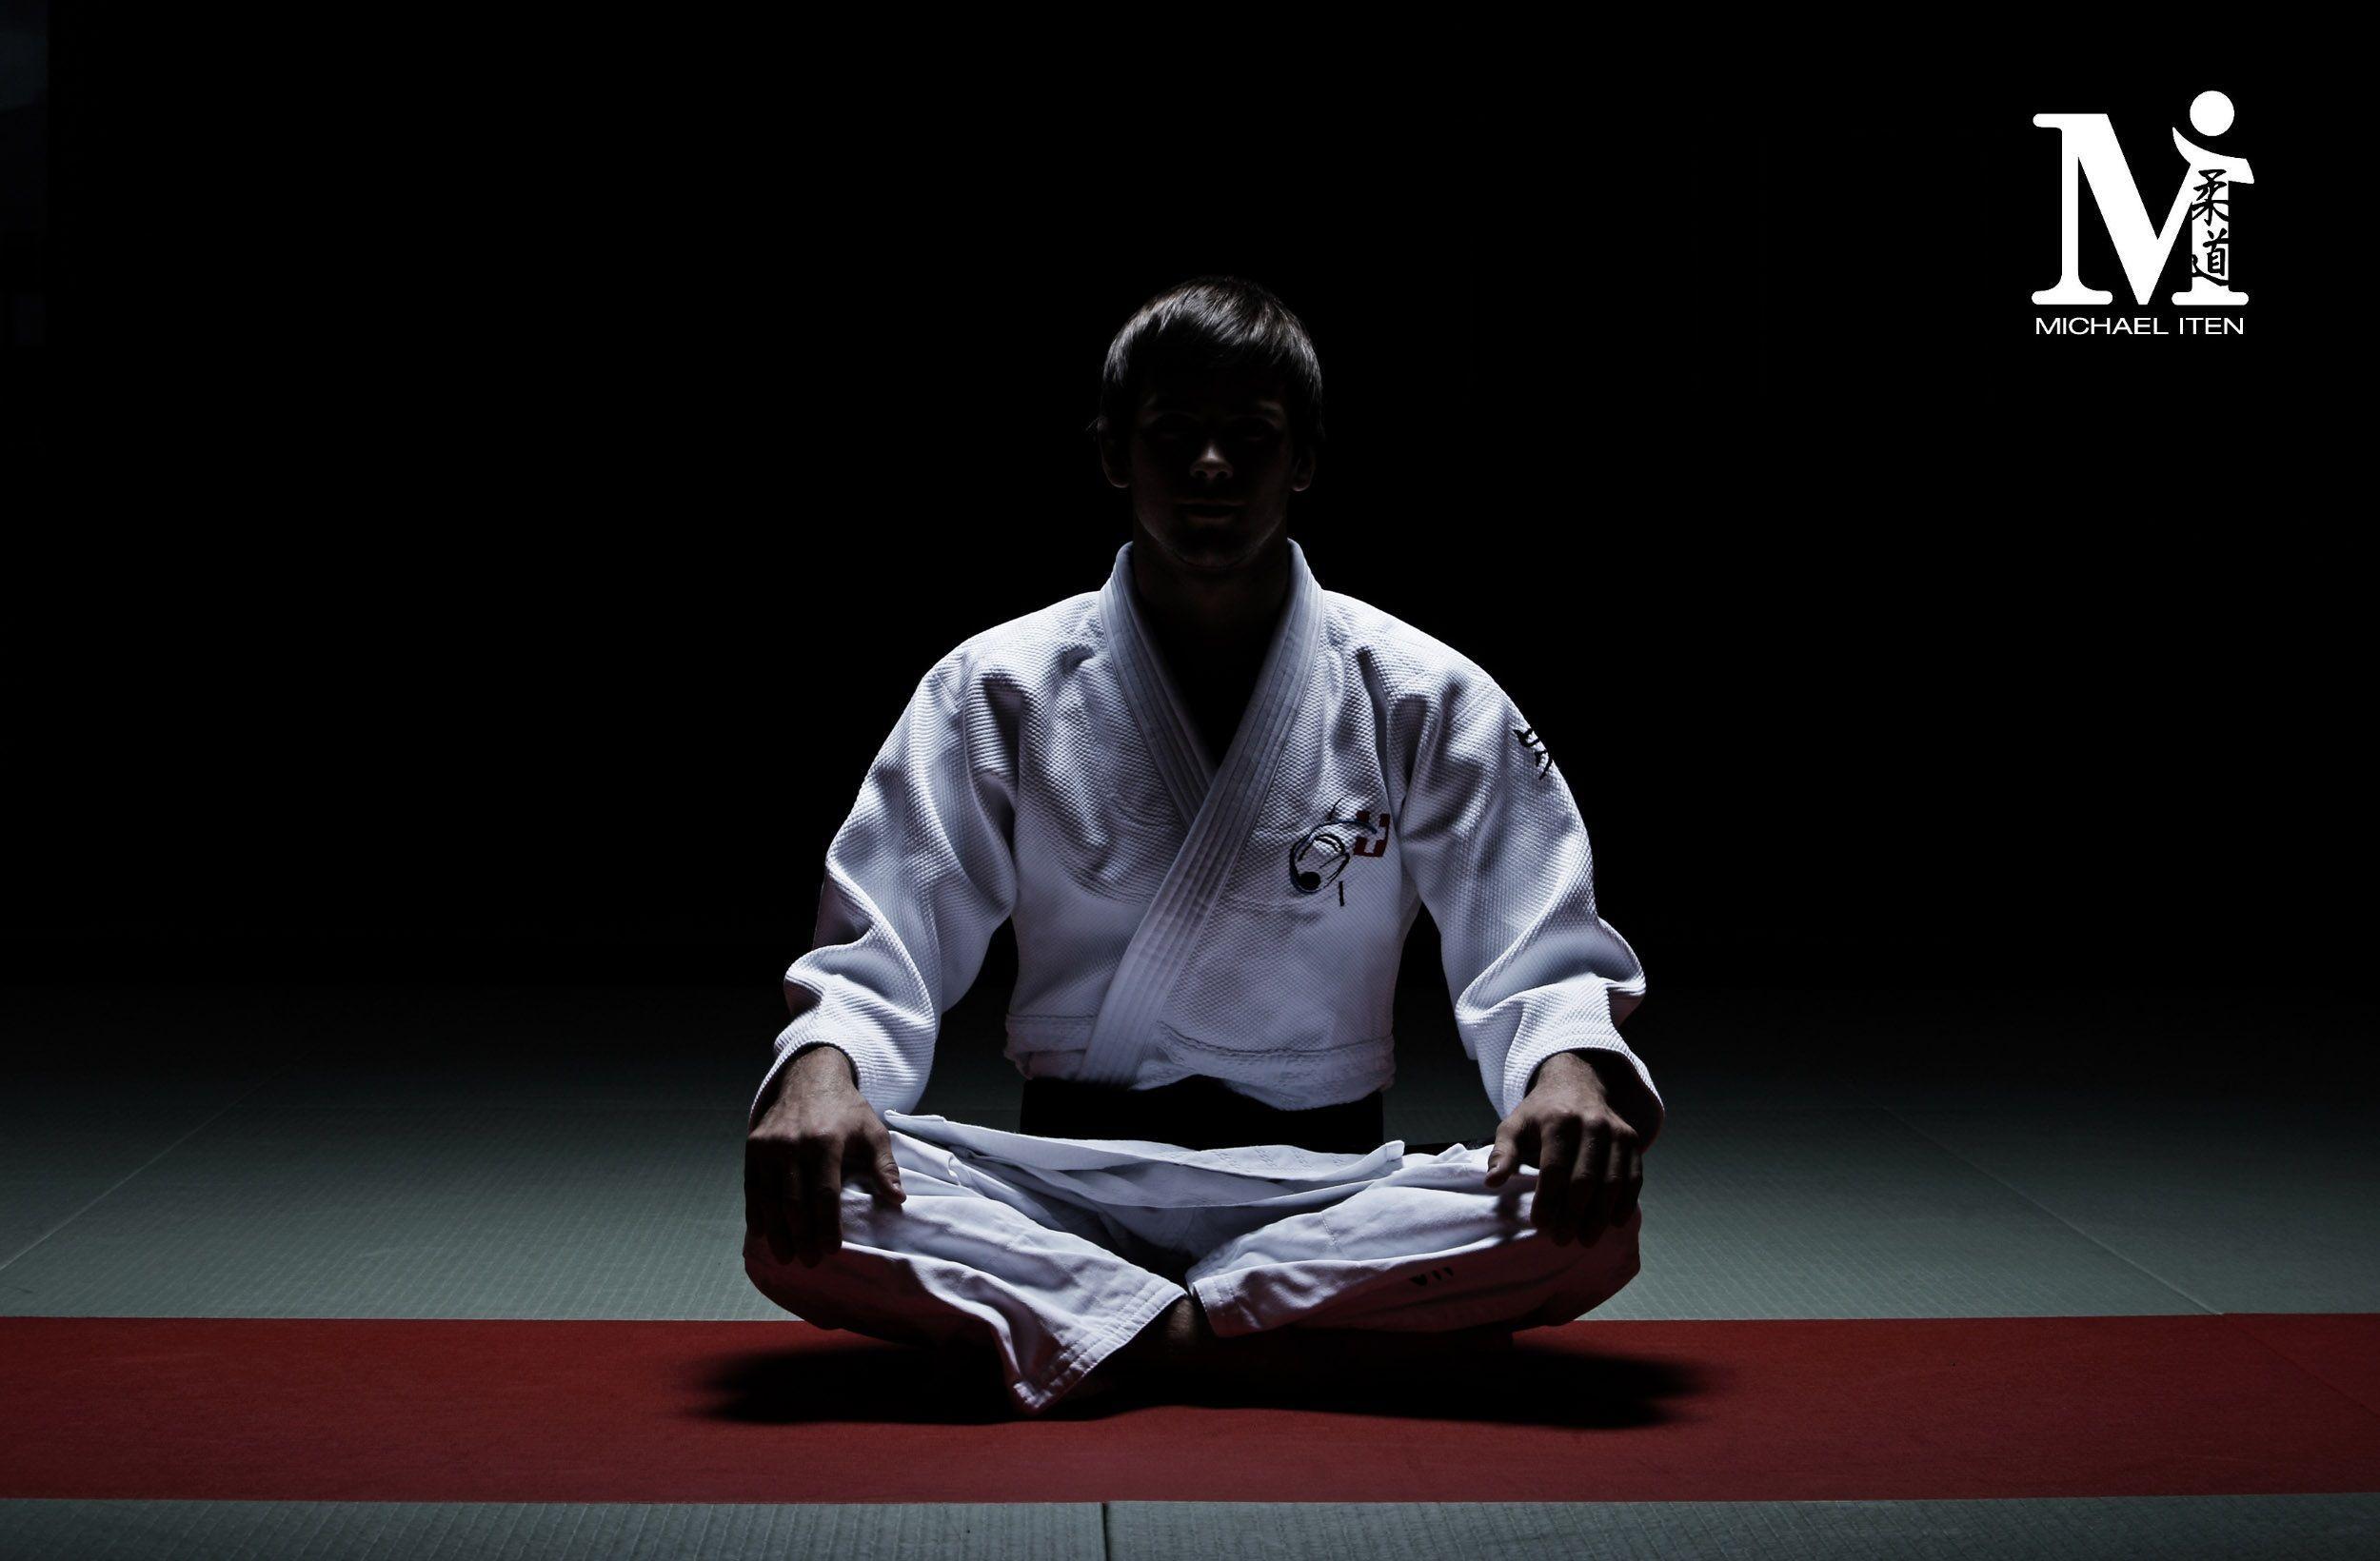 Japanese Jiu Jitsu Wallpapers Top Free Japanese Jiu Jitsu